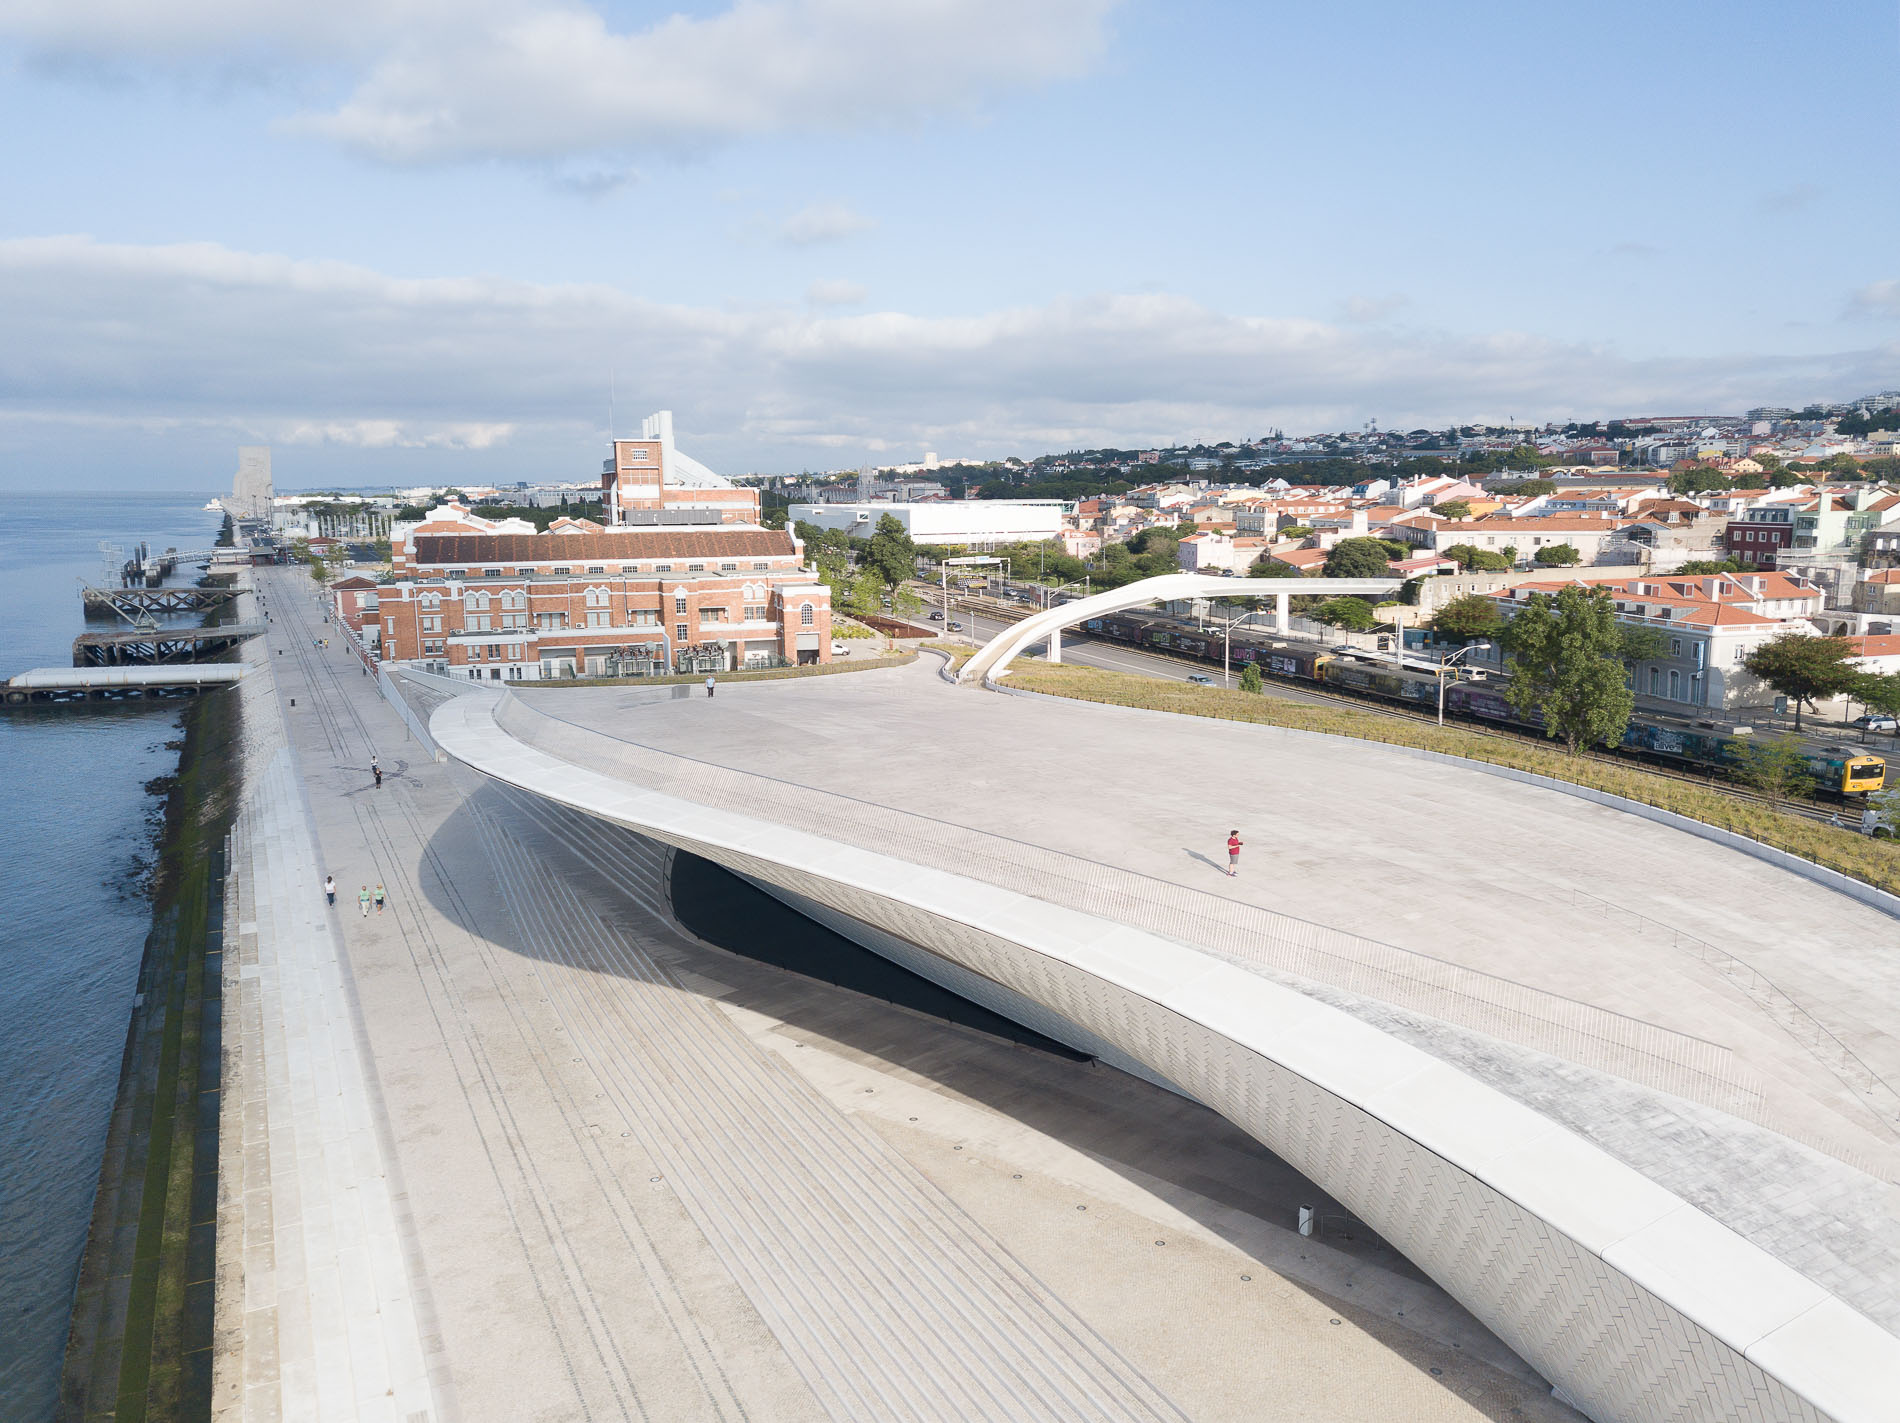 180625 Lisbon 005-Pano.jpg